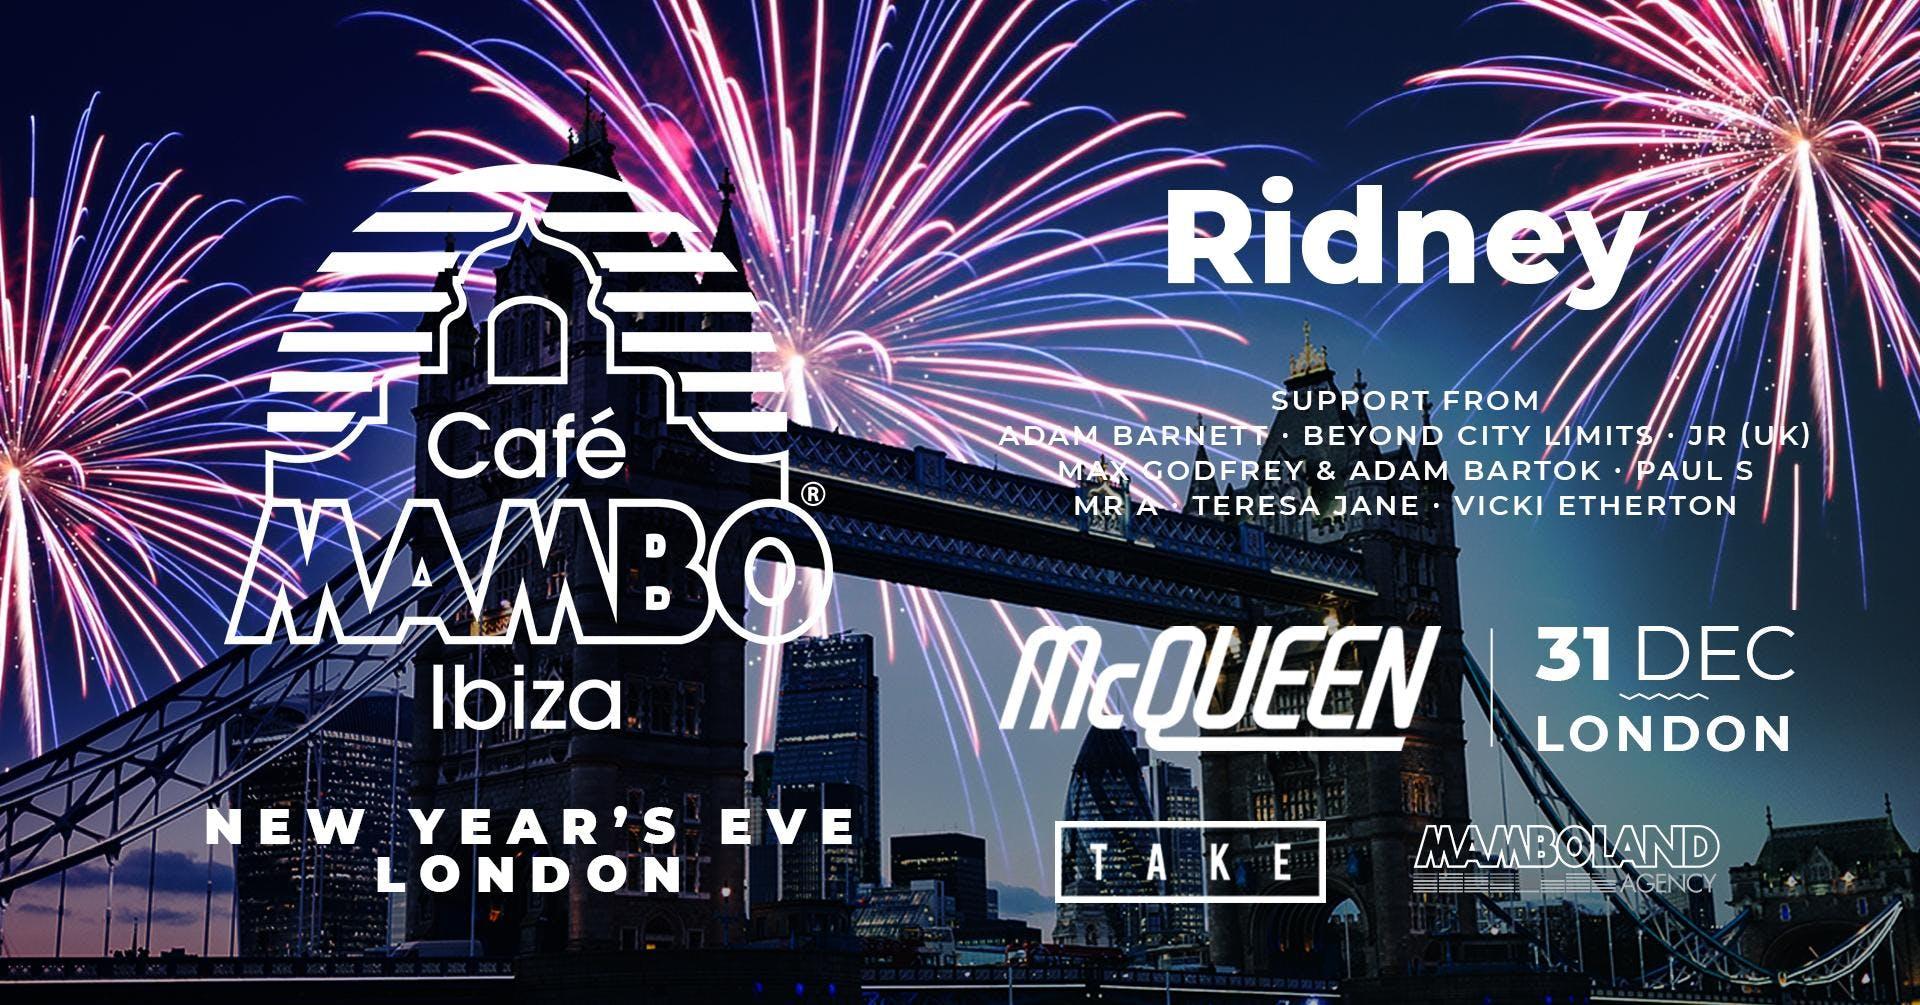 Cafe Mambo Ibiza New Year's Eve in London 2018/2019